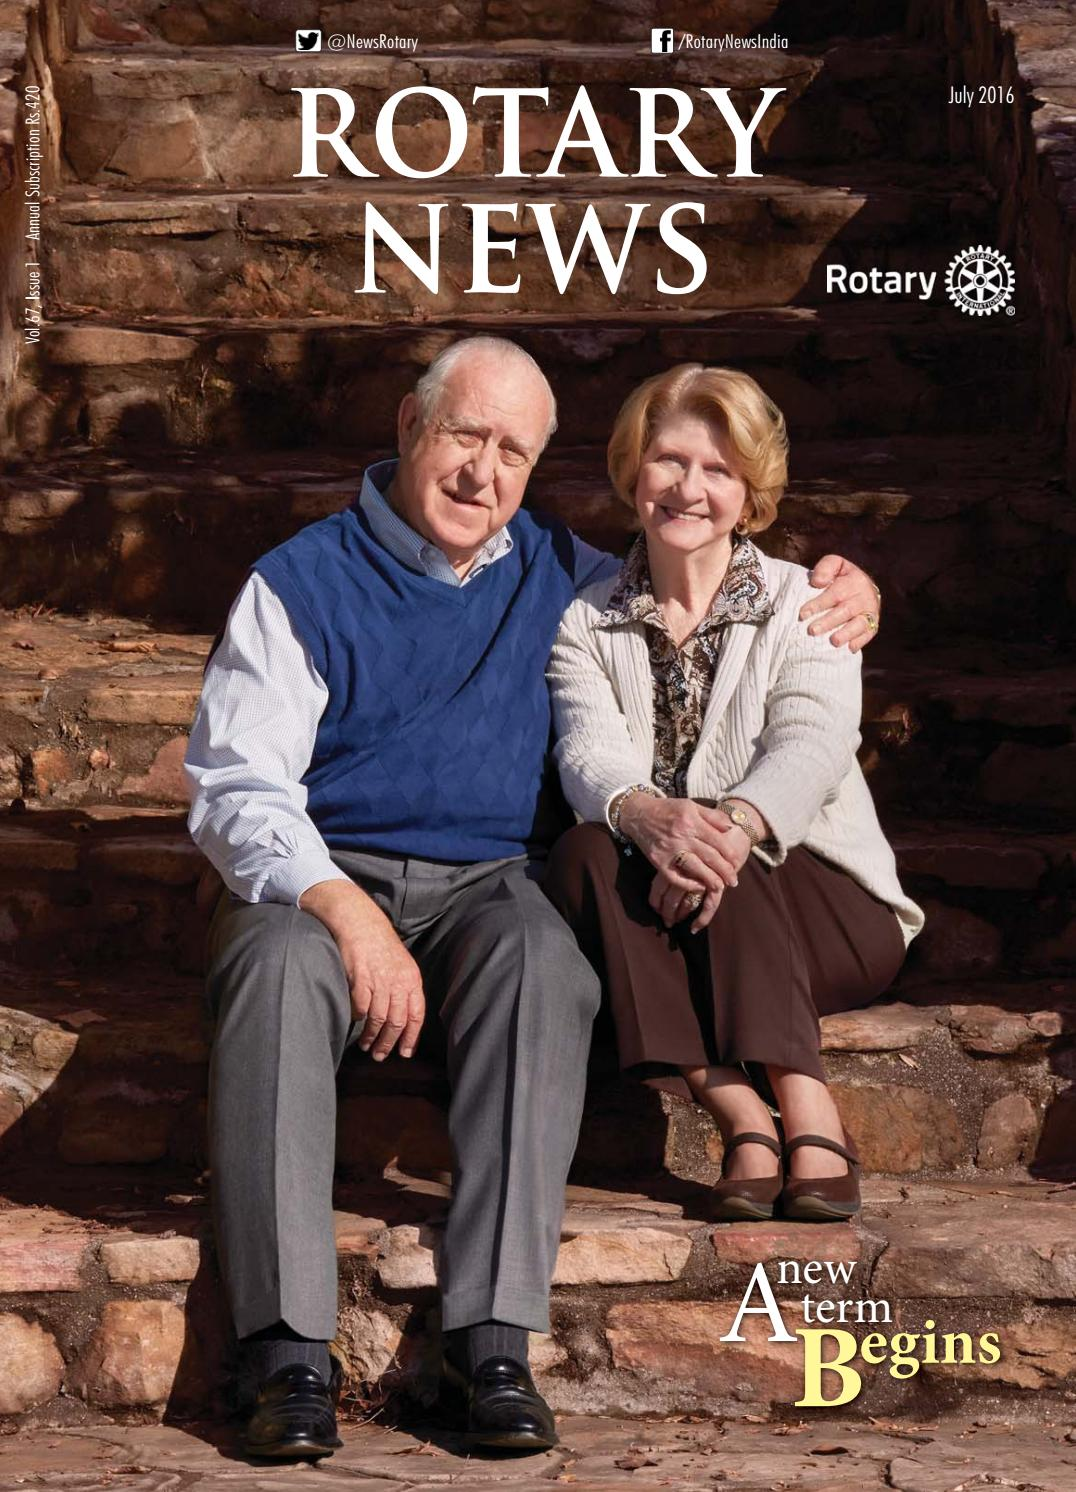 Rotary News - July 2016 by Rotary News - issuu